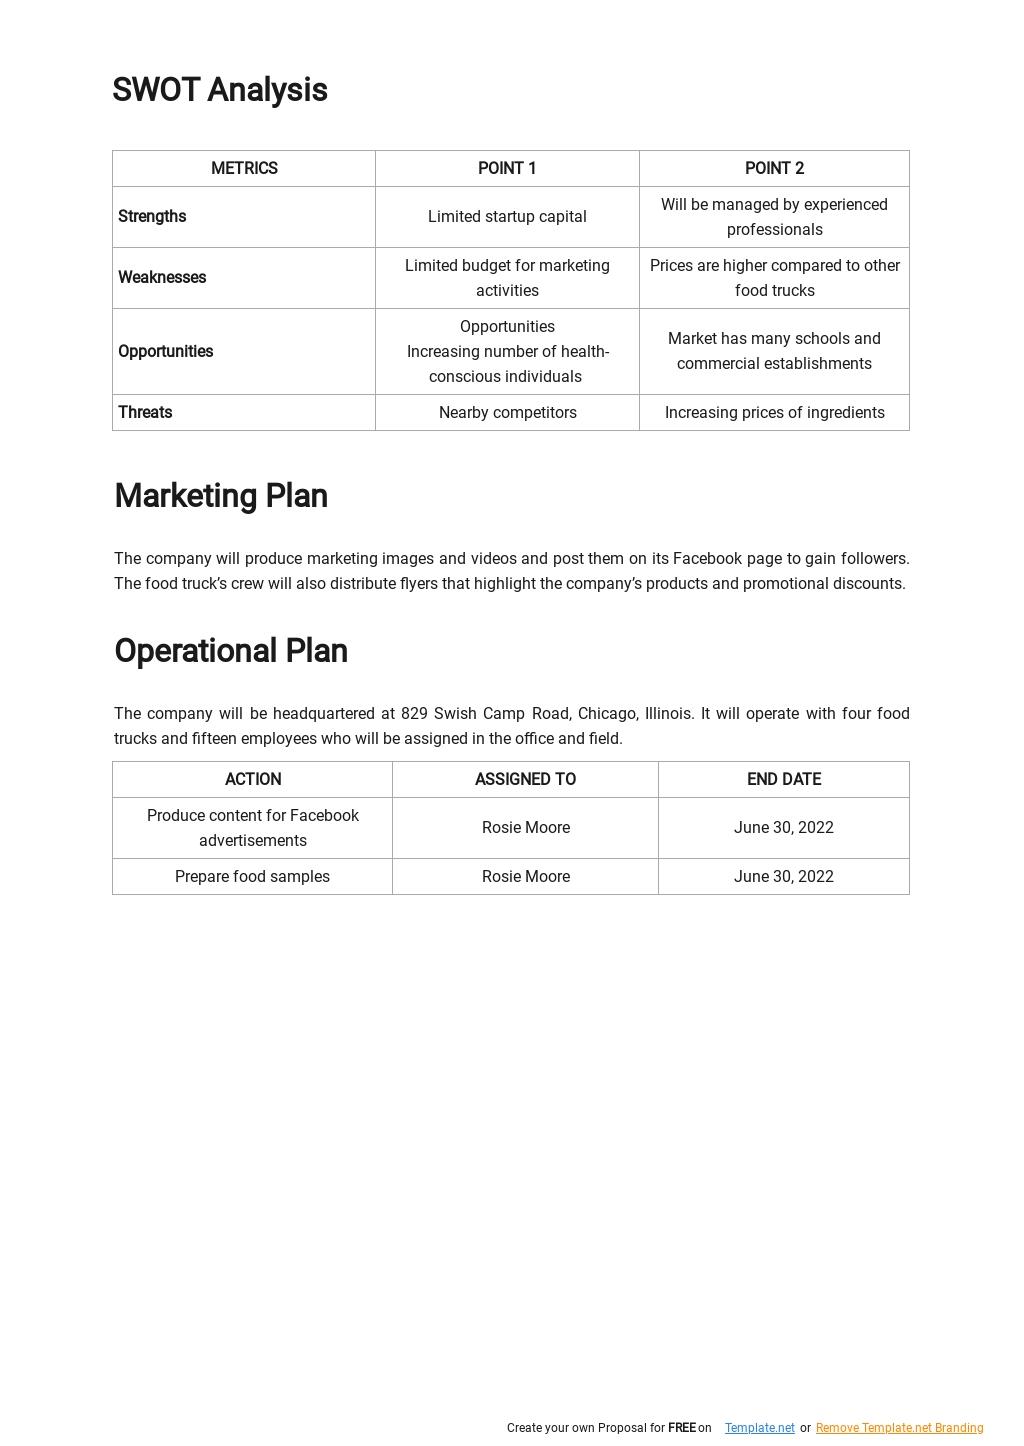 Mobile Food Truck Business Plan Sample 2.jpe